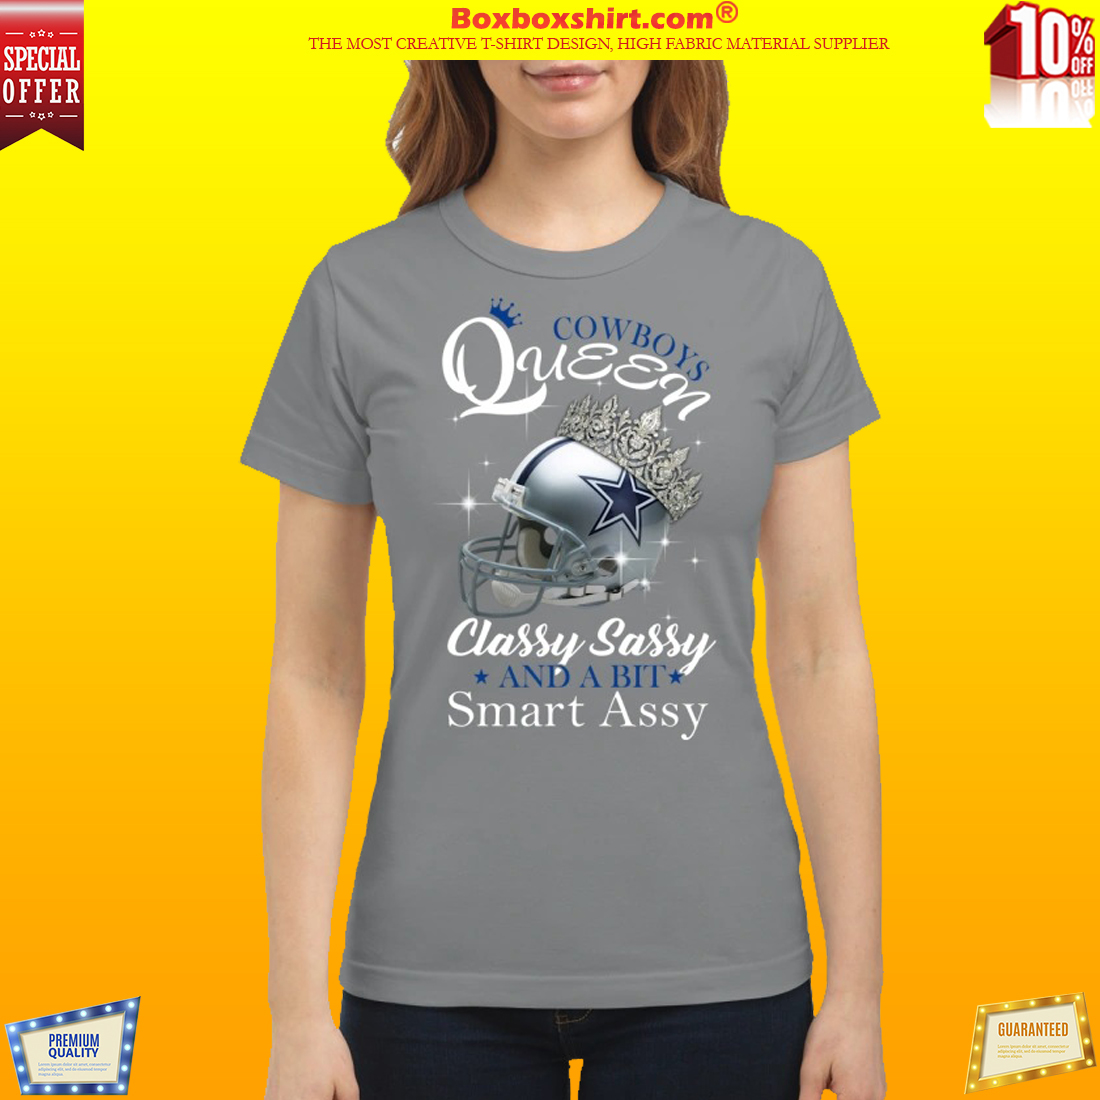 Dallas Cowboys queen classy sassy and a bit smart assy classic shirt